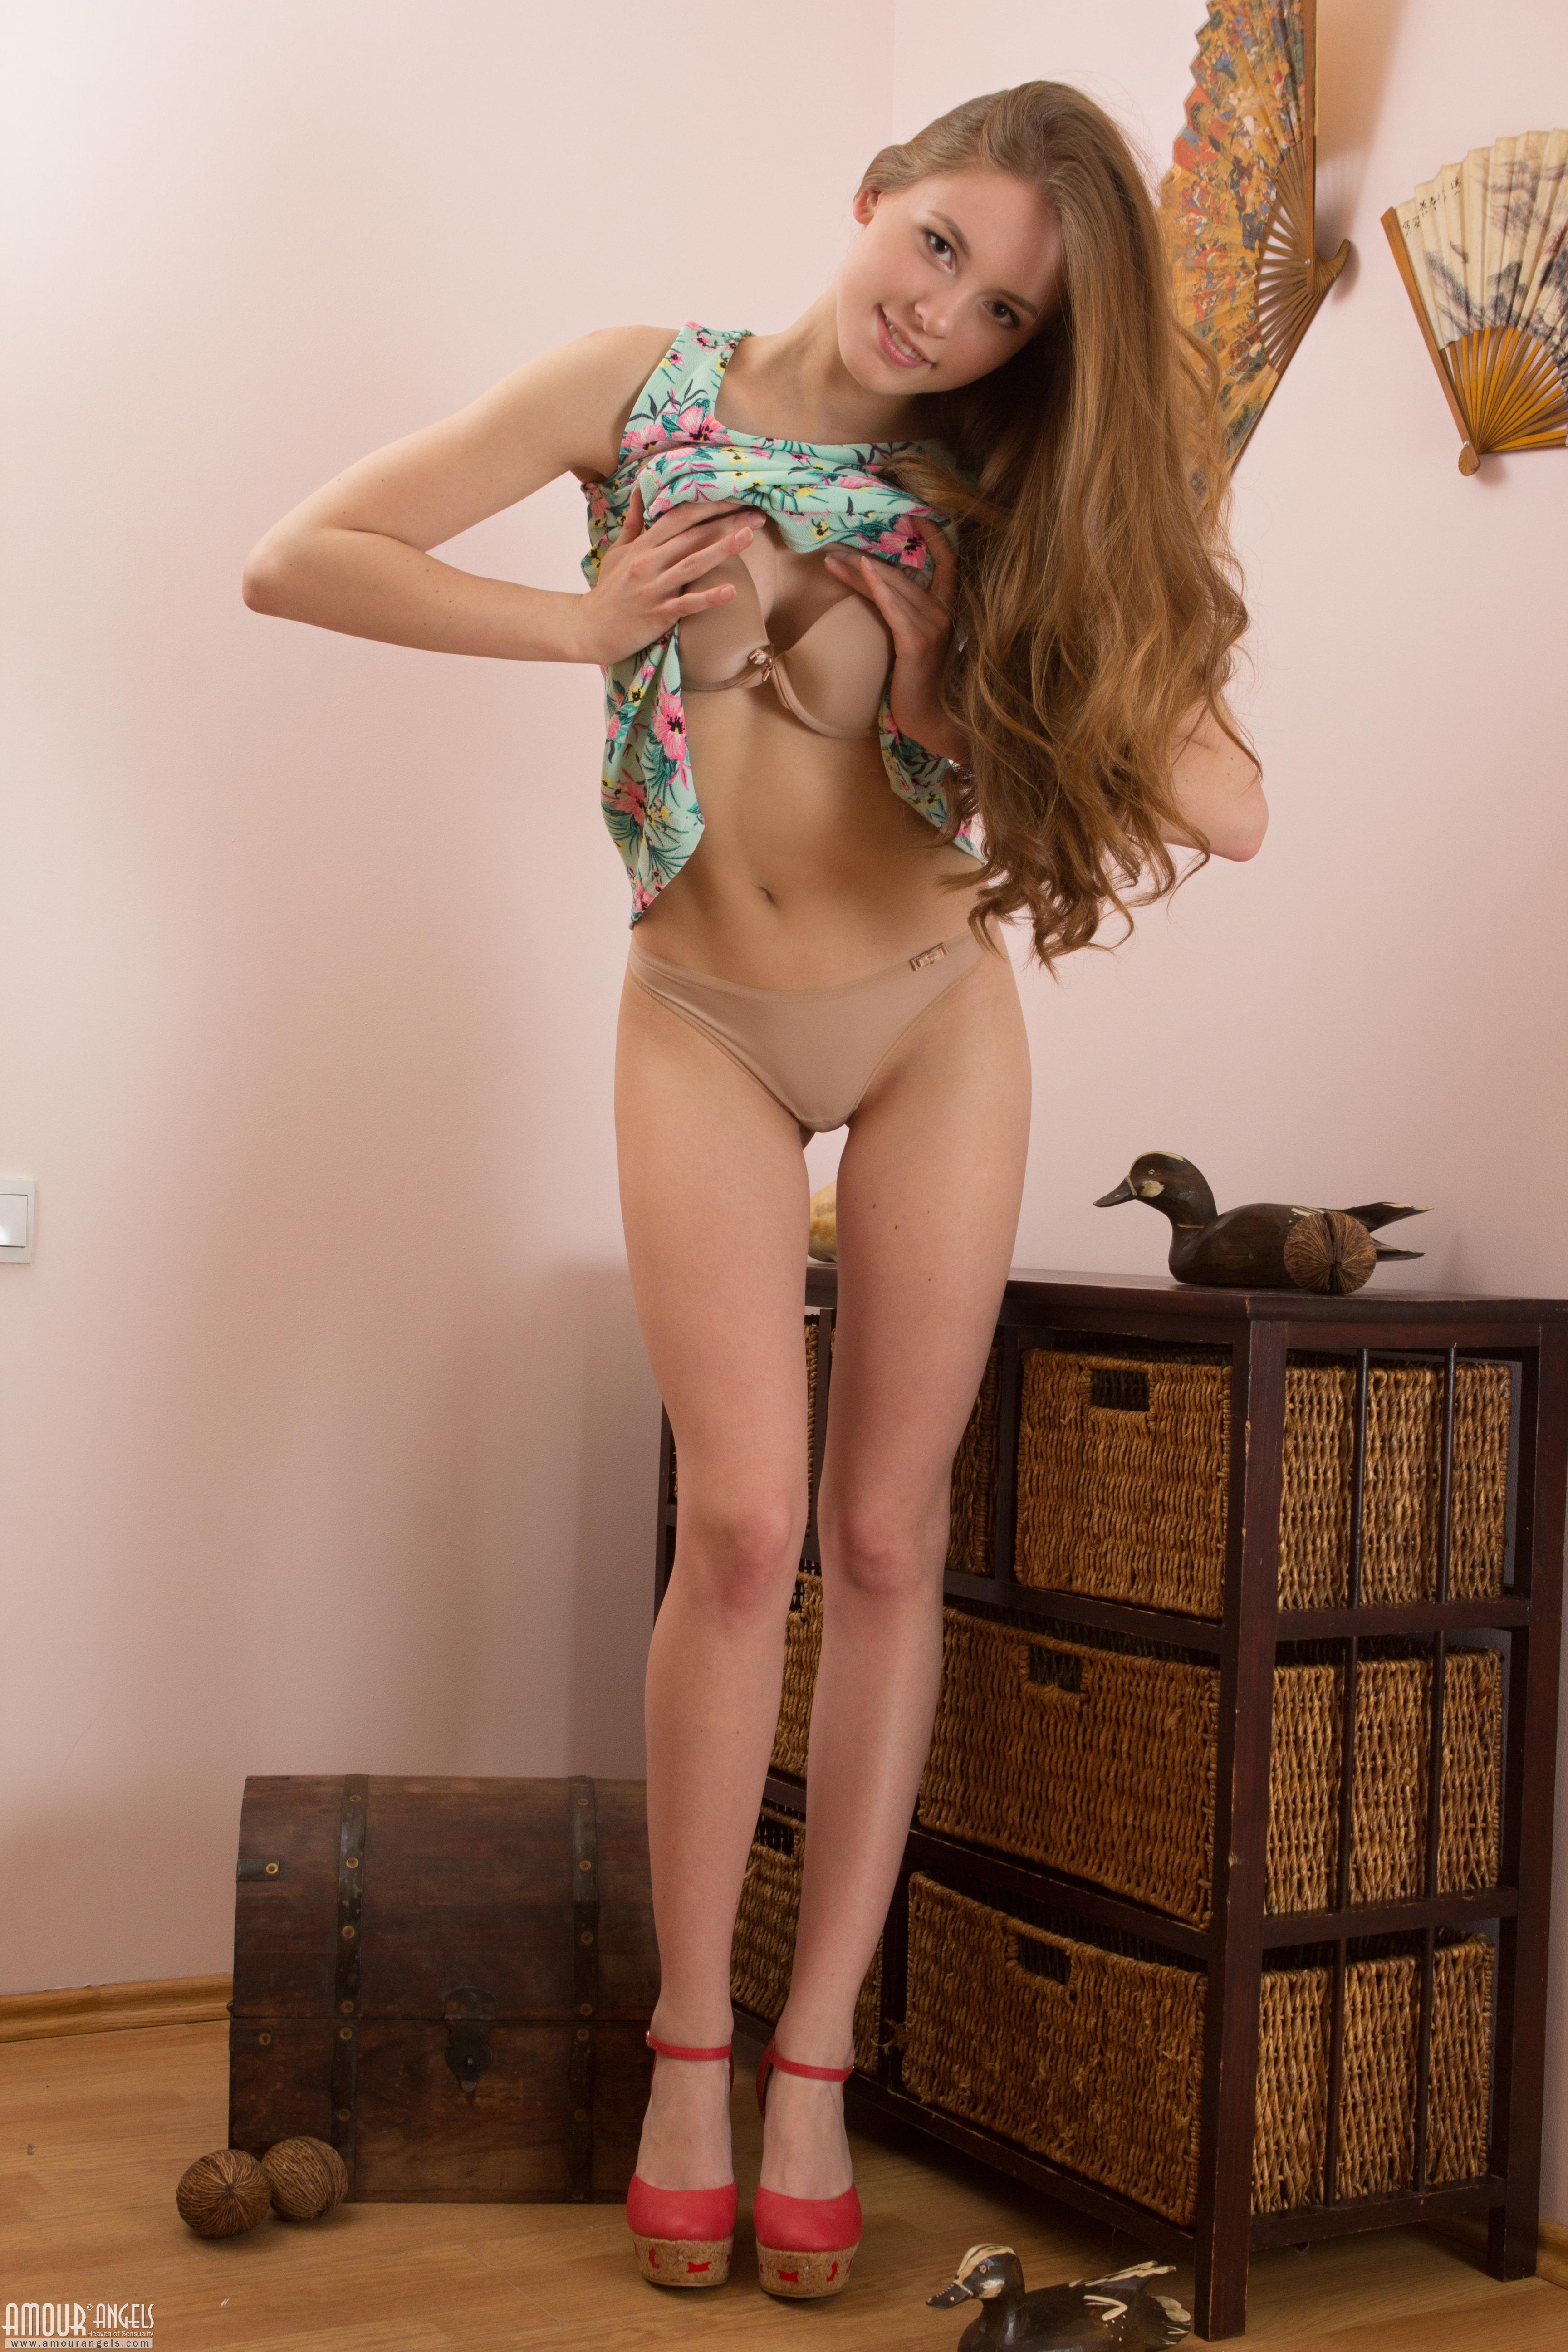 nickelodeon hot girls porn vids